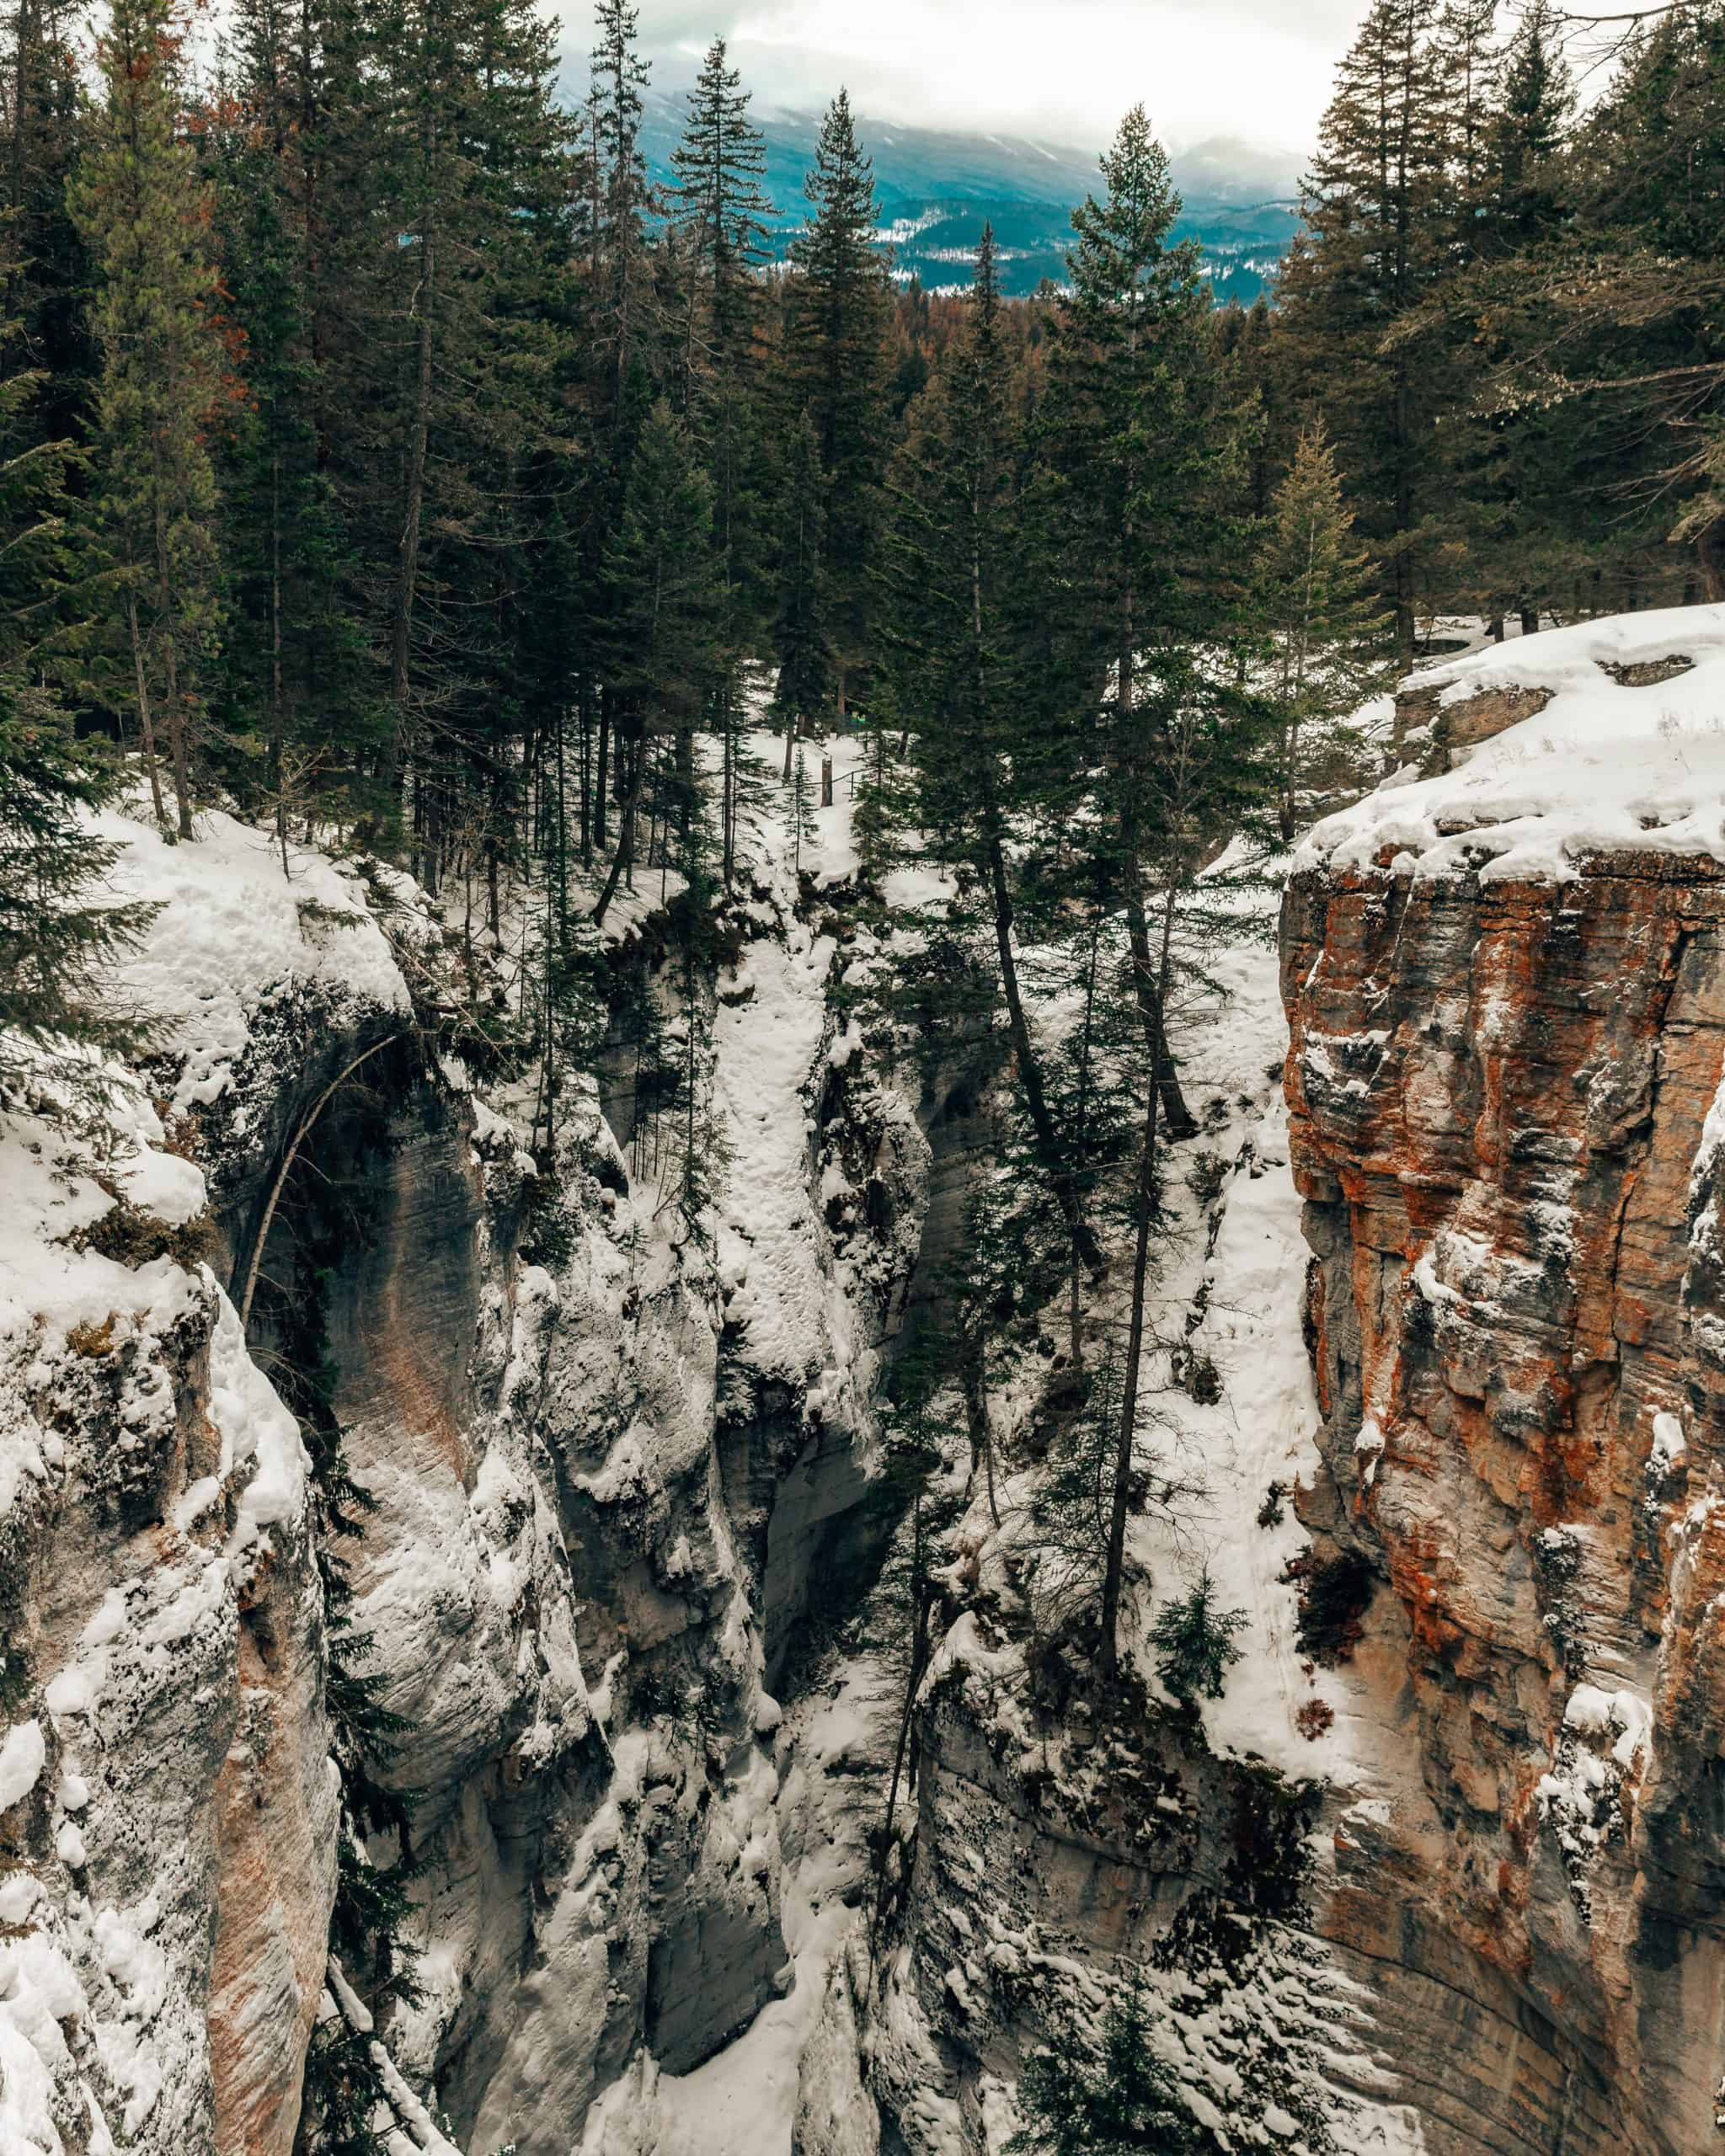 Maligne Canyon in Winter in Jasper, Canada